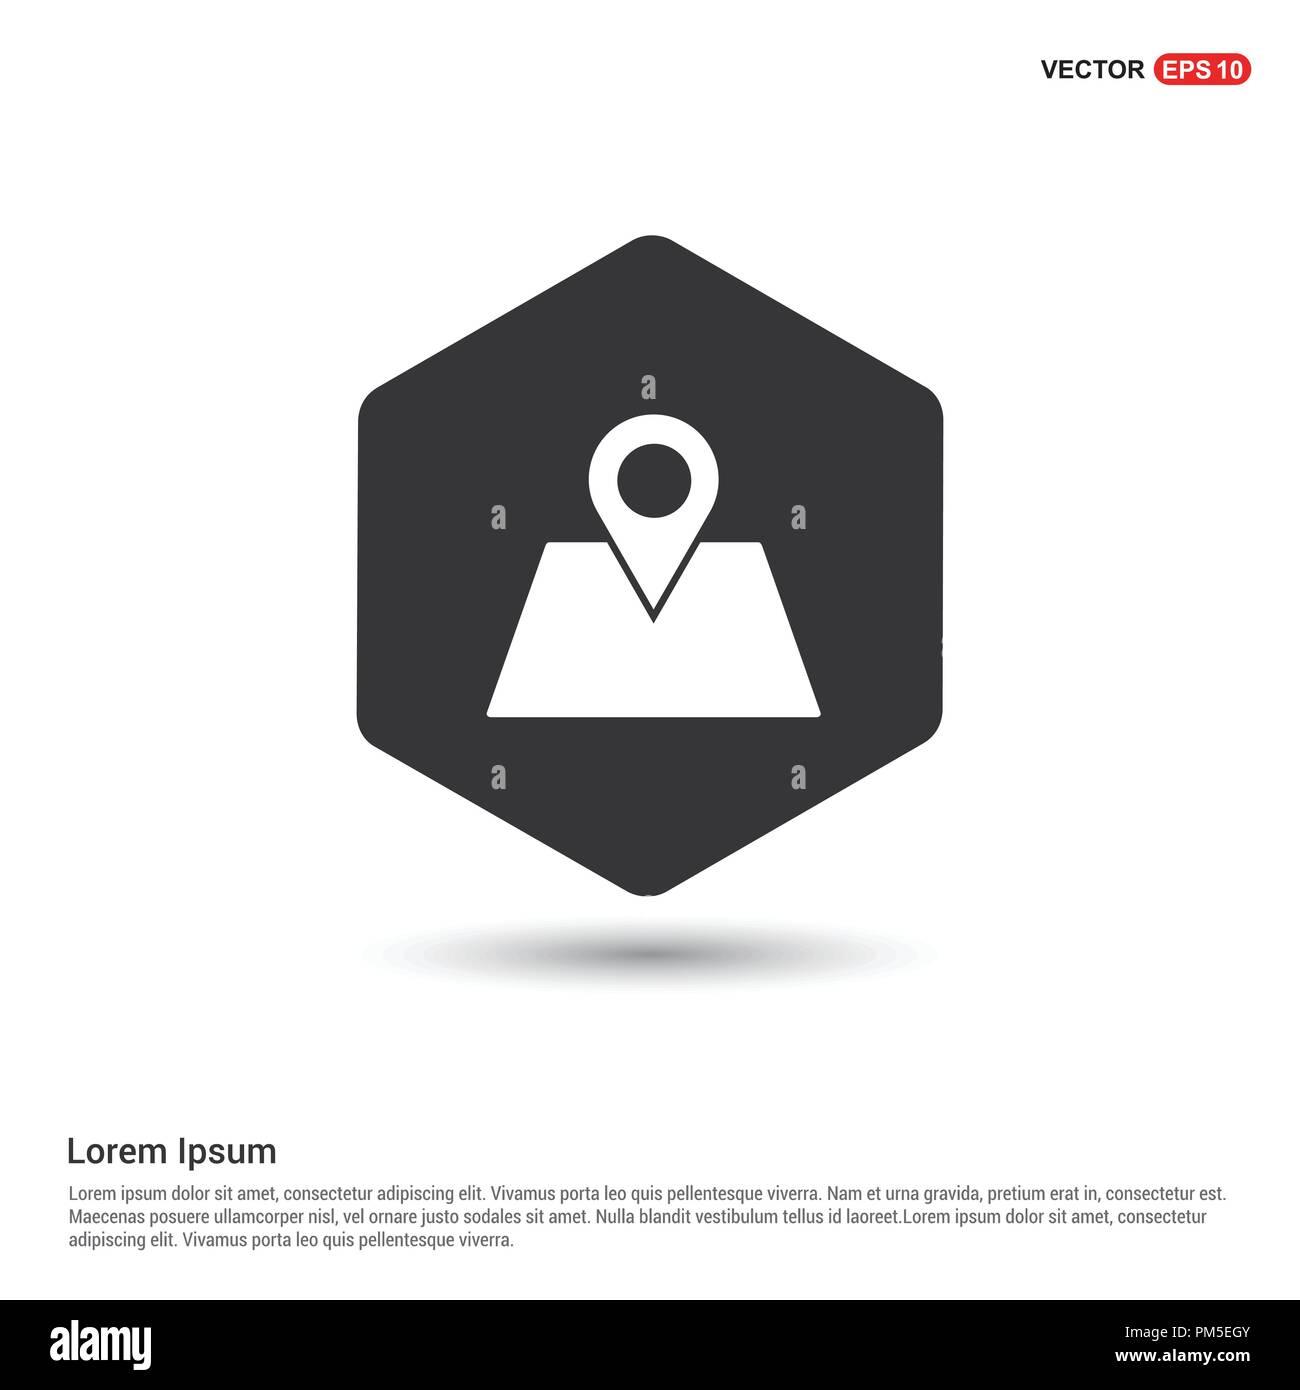 Map location icon Hexa White Background icon template - Free